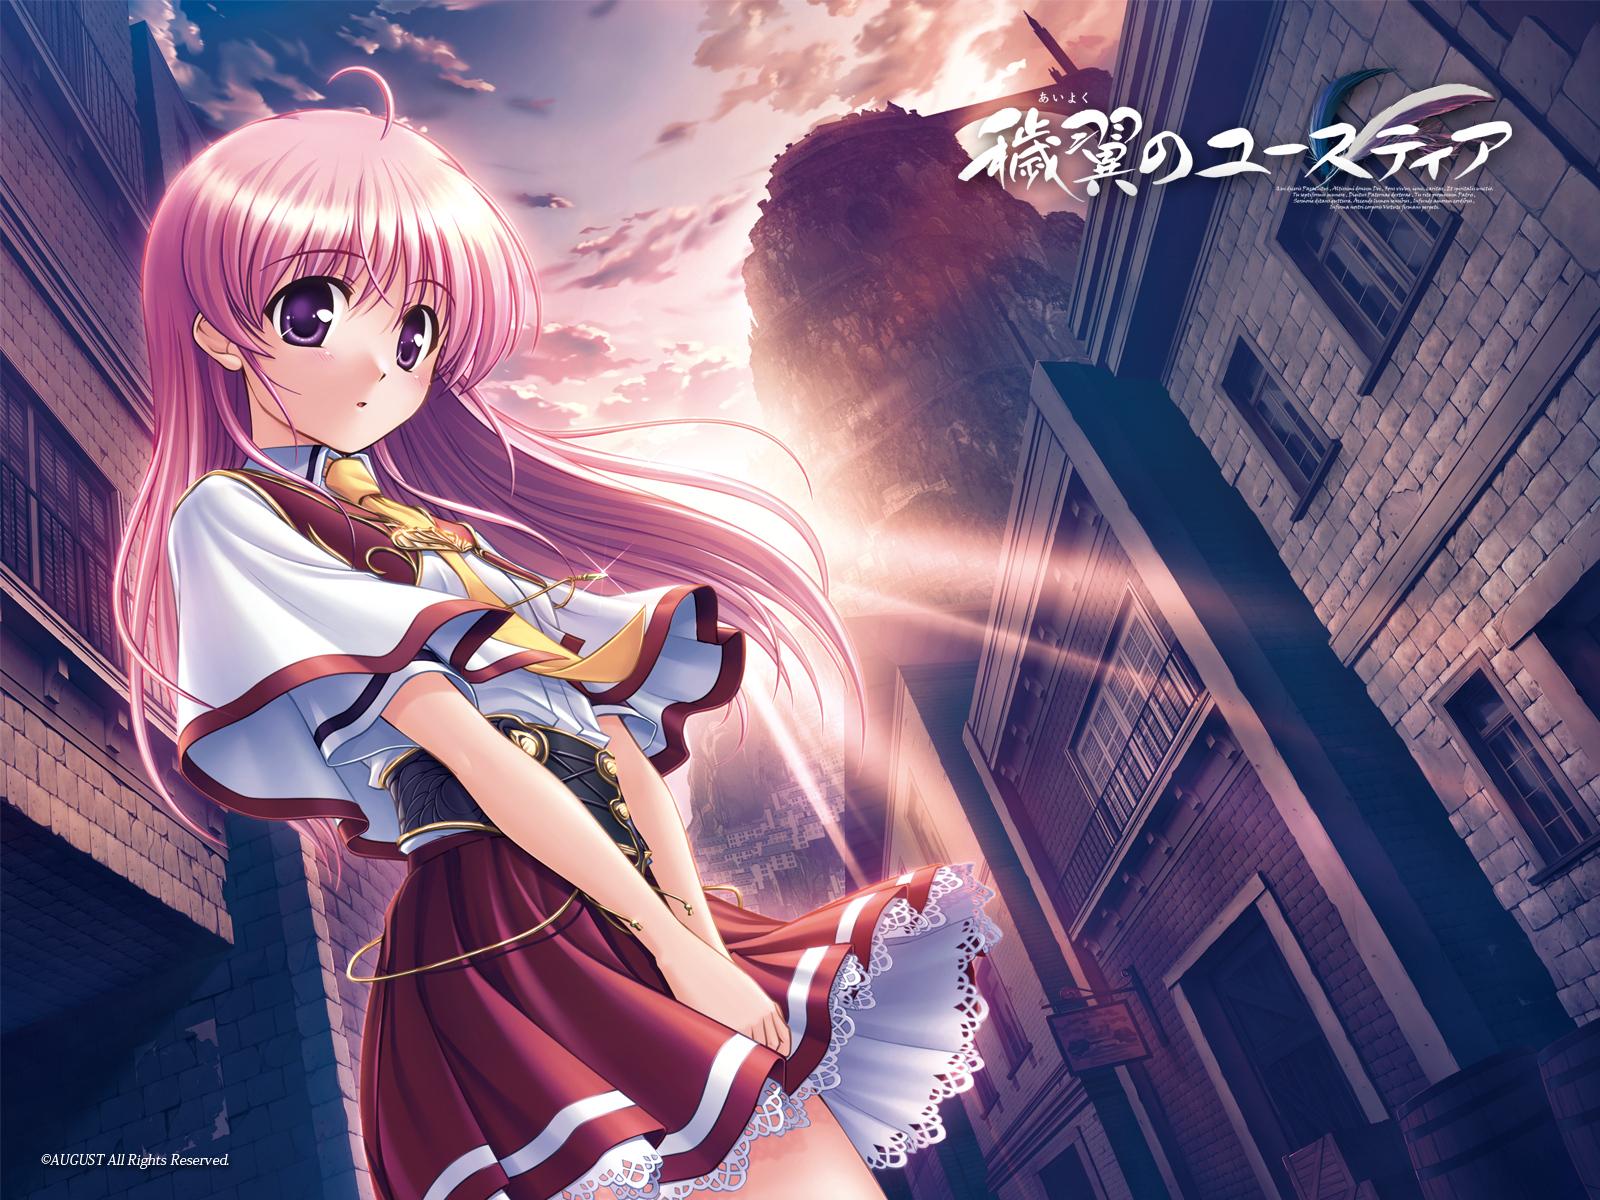 Download Cute Anime Girls Wallpaper Full Hd Wallpapers   UK News 1600x1200